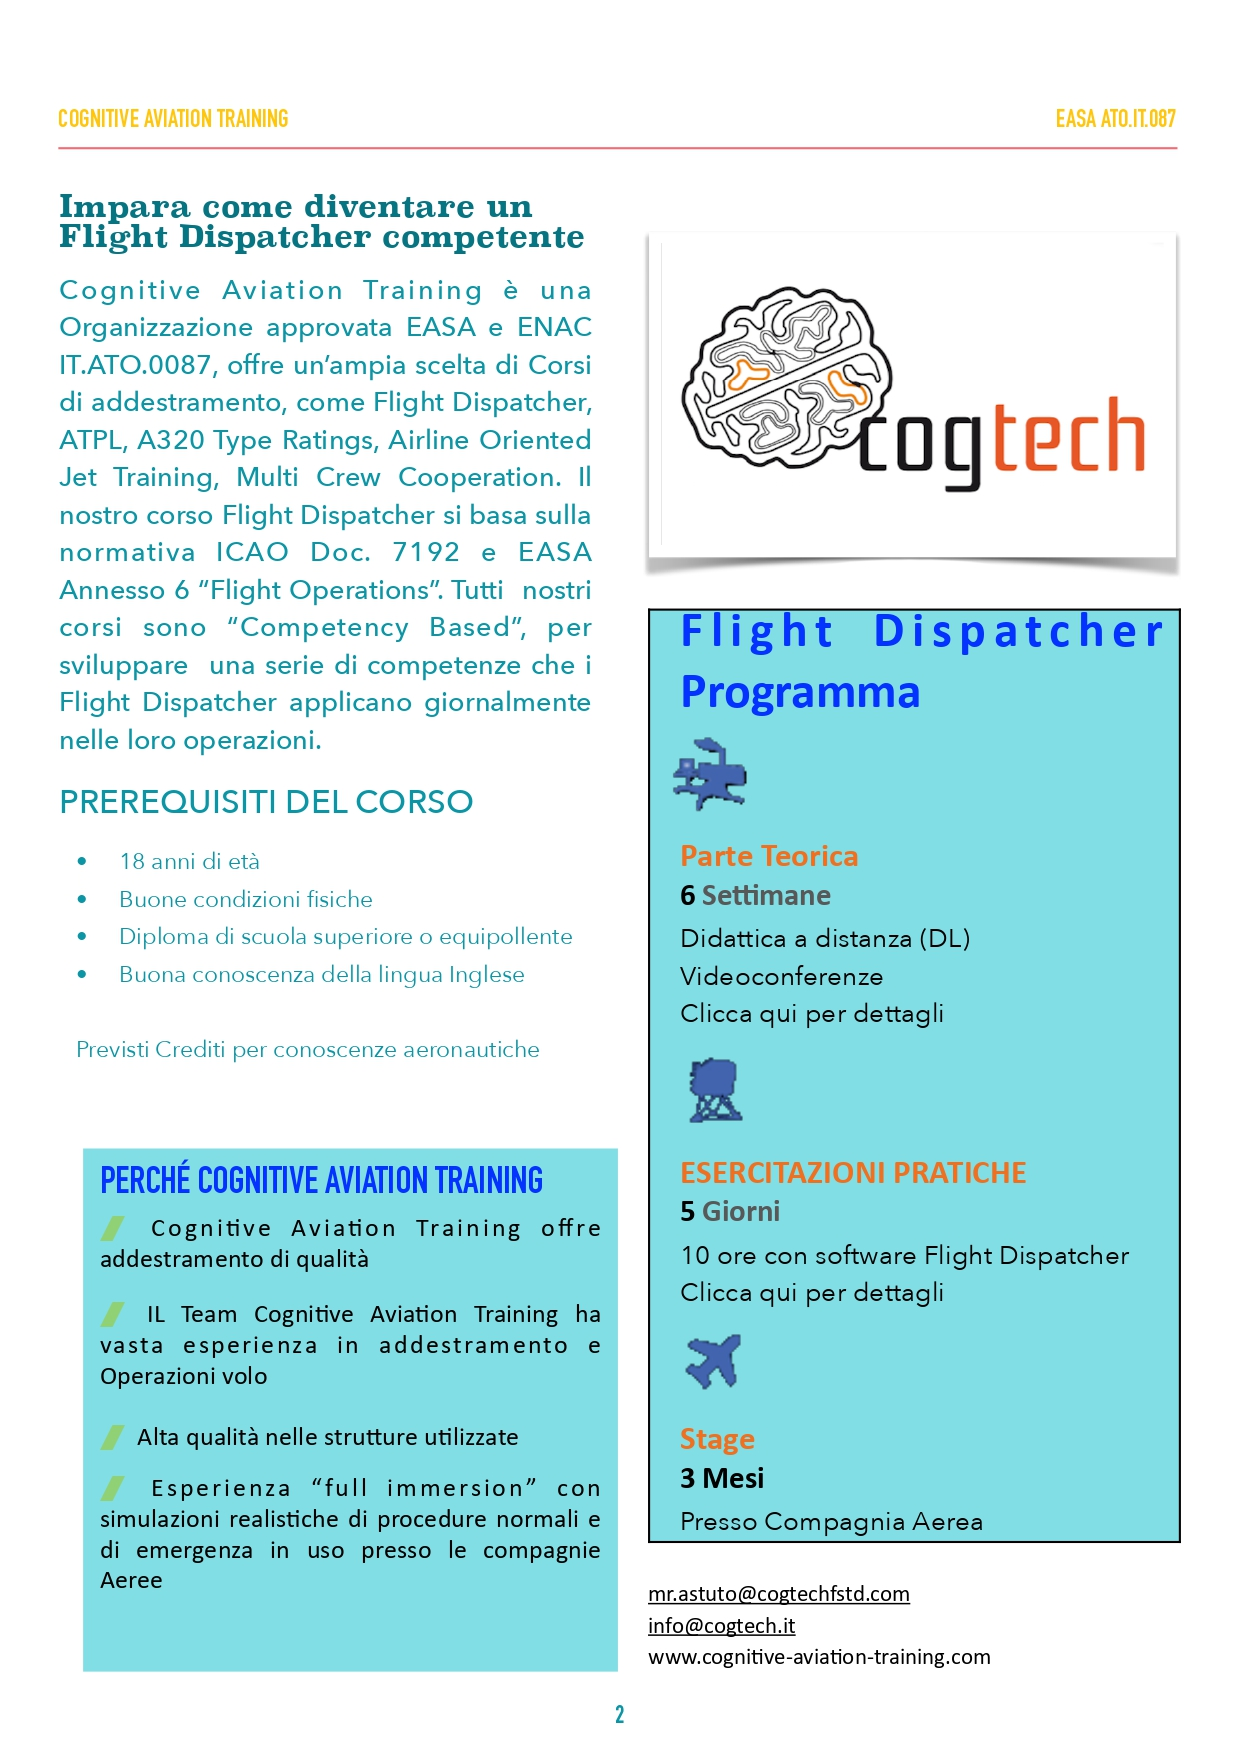 Flight Dispatcher Flyer Cogtech ITA_page-0002